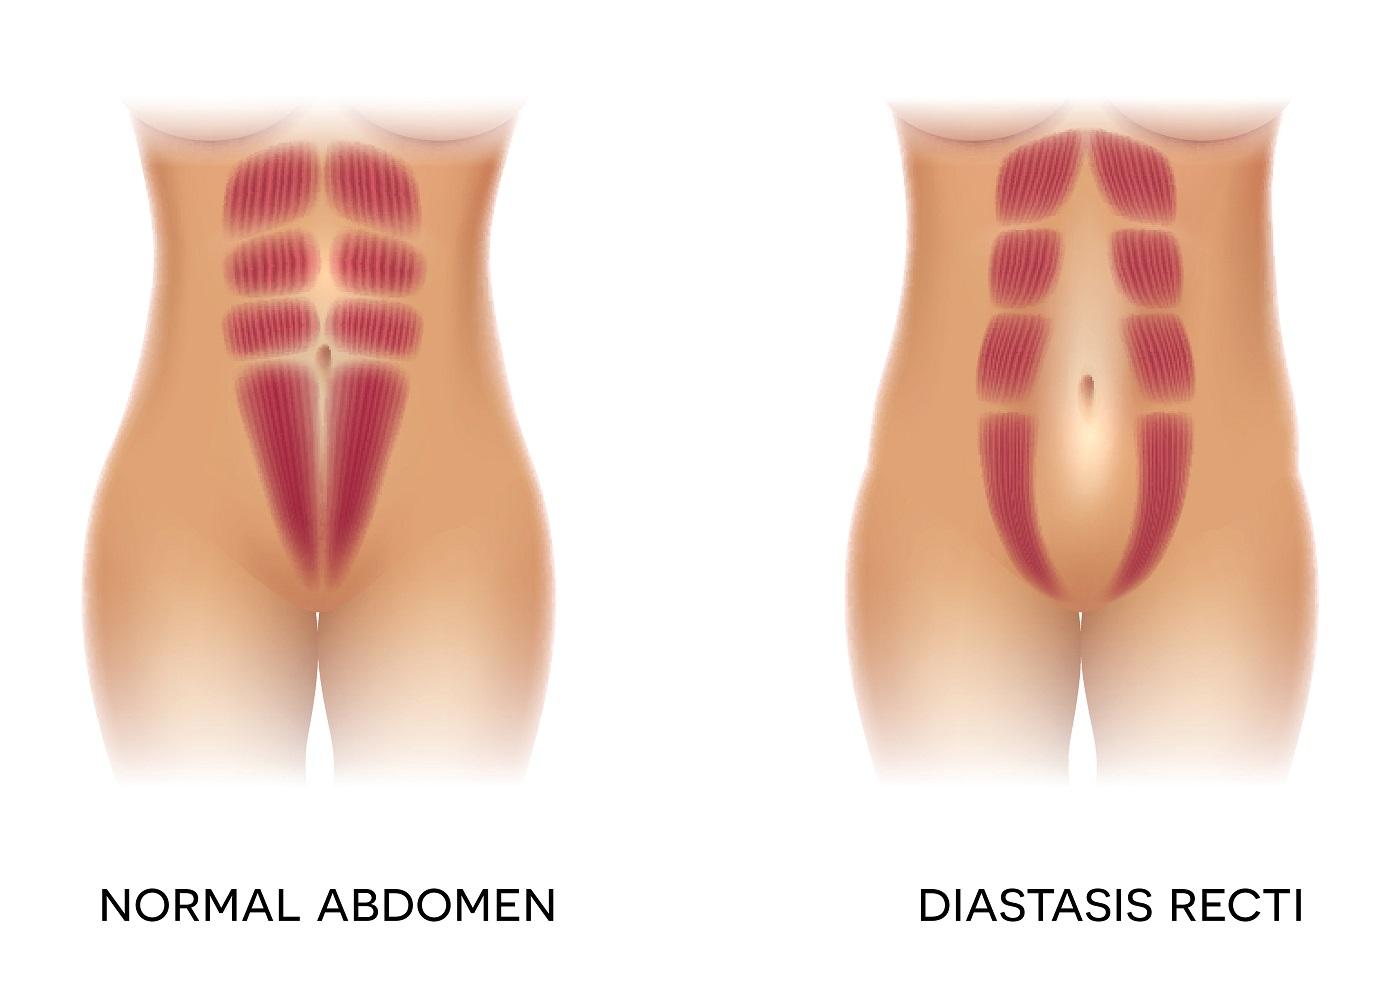 Dealing with Diastasis Recti during Pregnancy